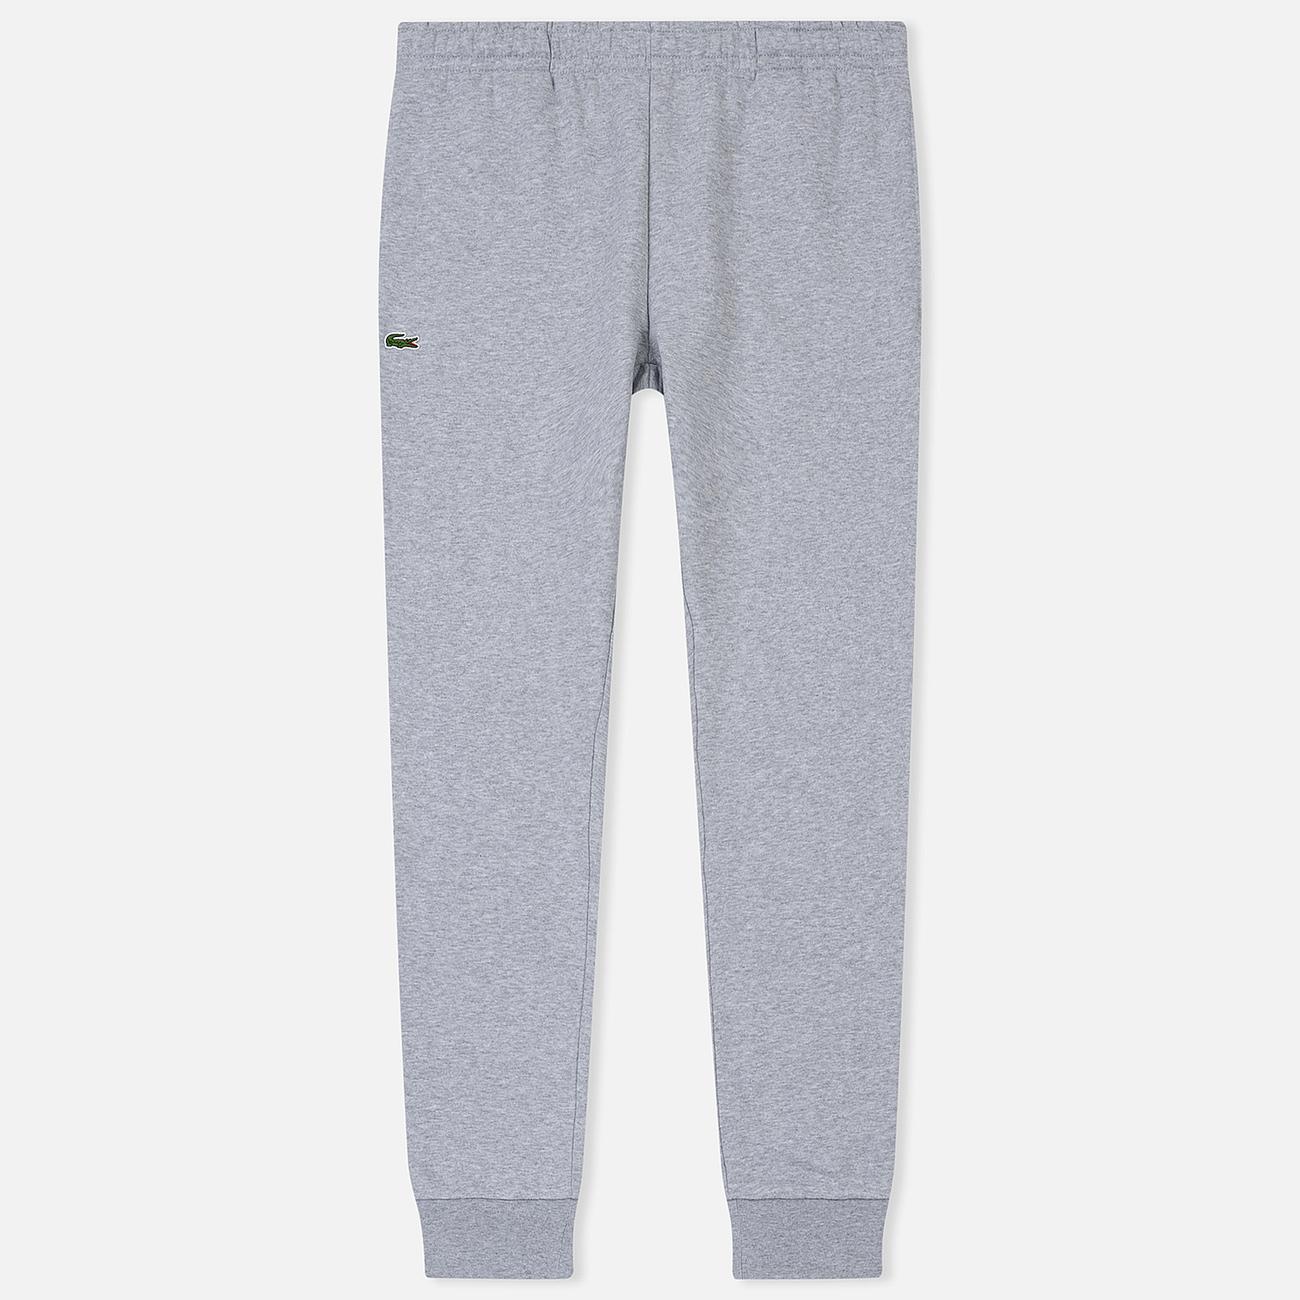 Мужские брюки Lacoste Sport Cotton Fleece Silver Chine